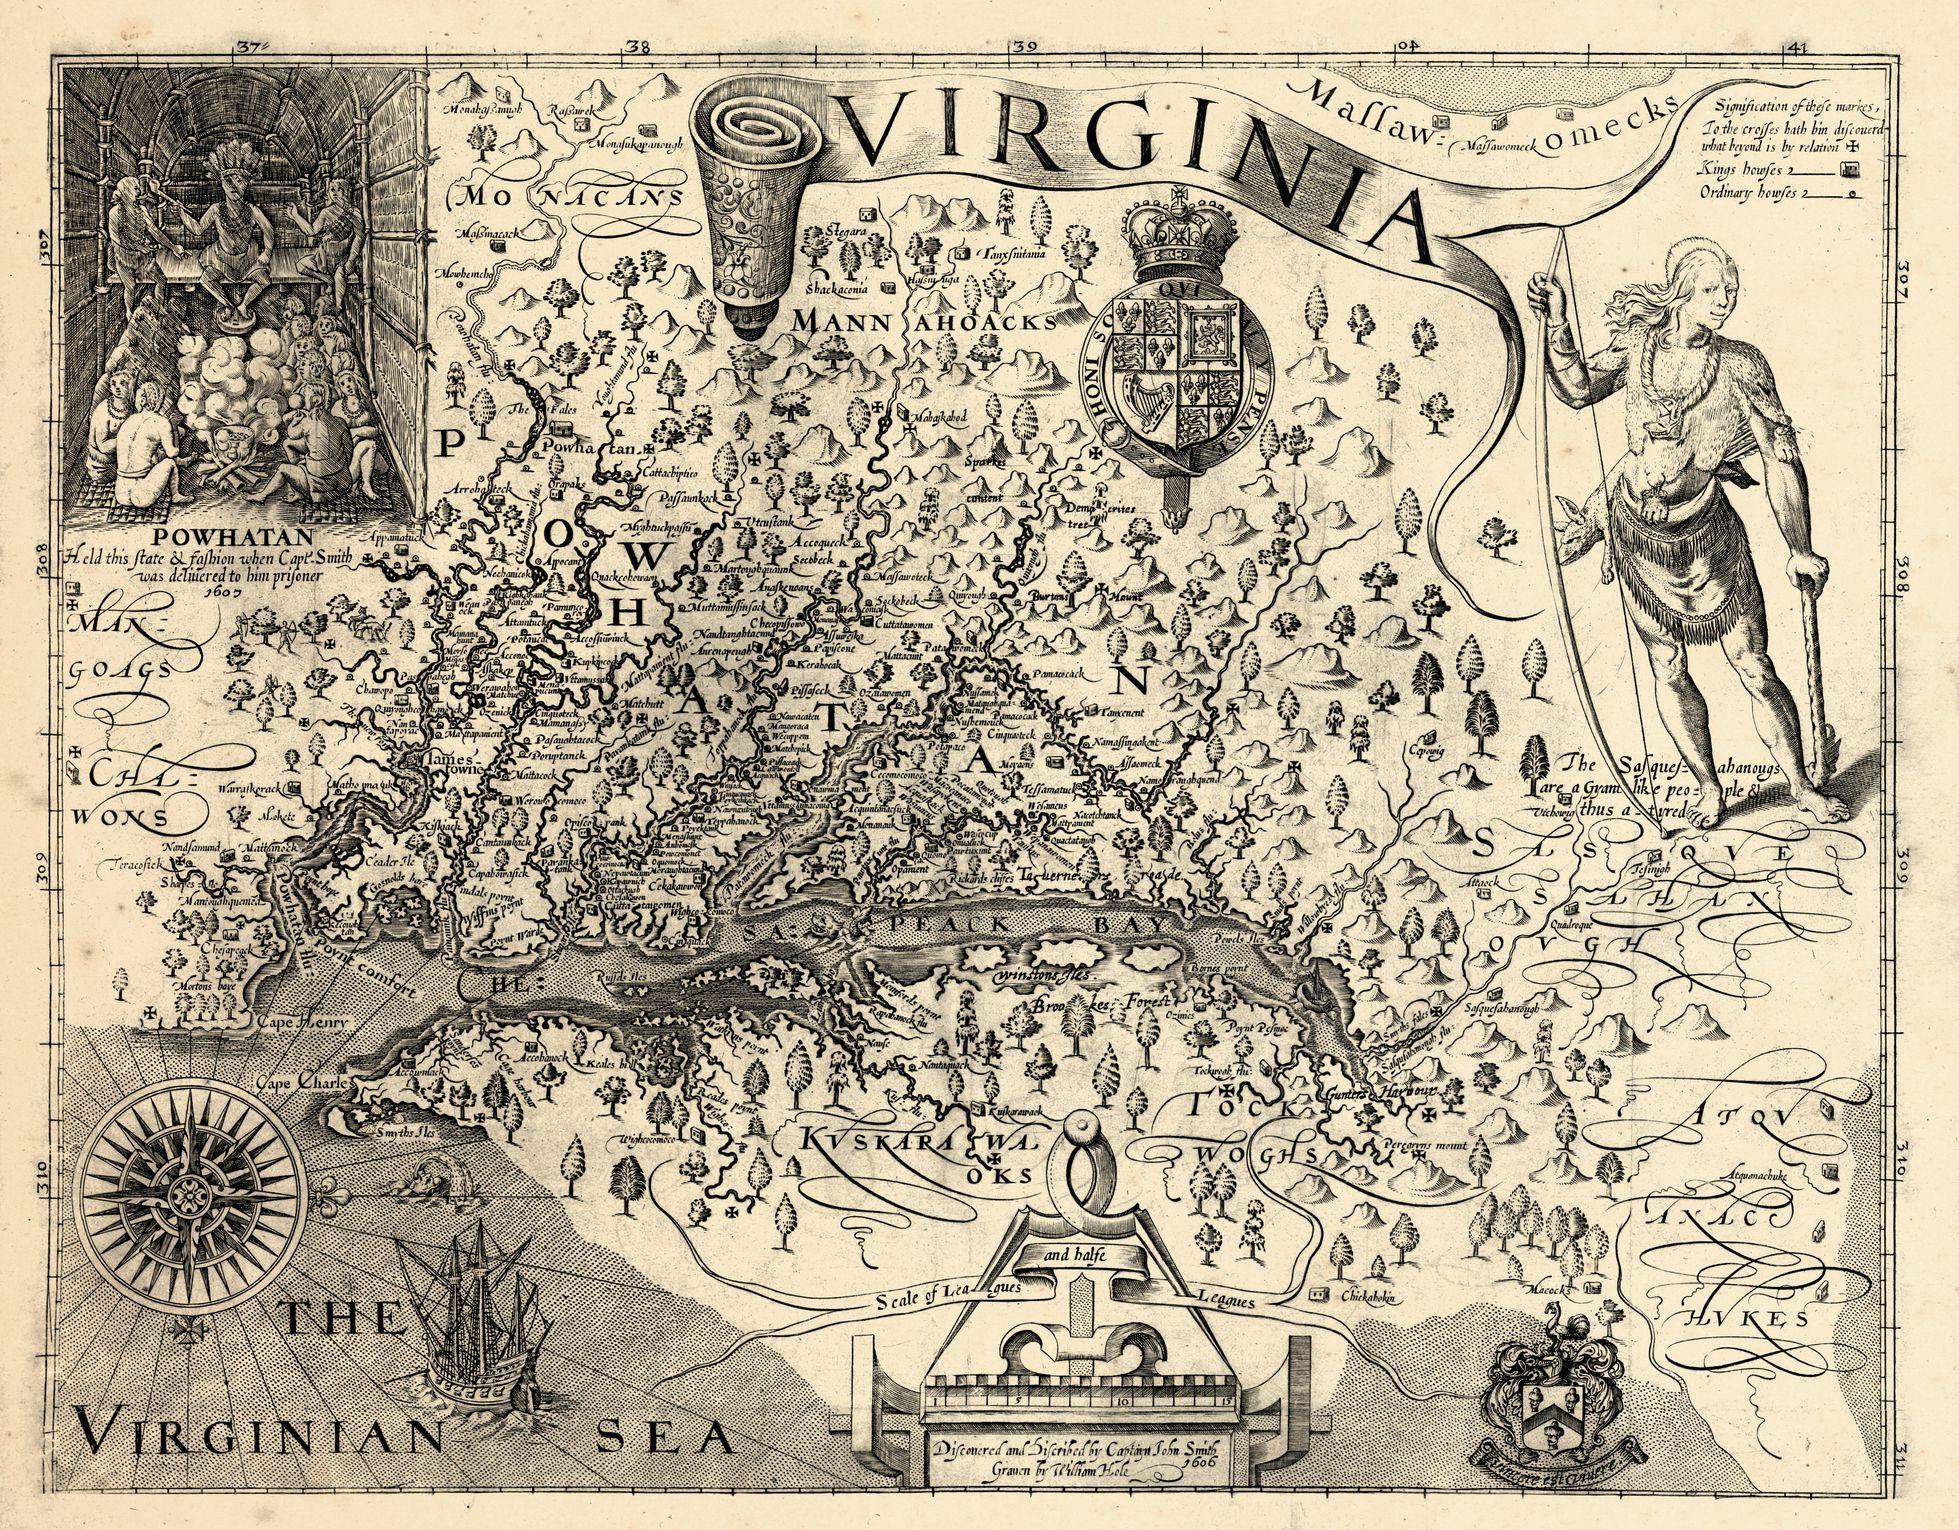 Virginia, 1606, Jamestown Described By Captain John